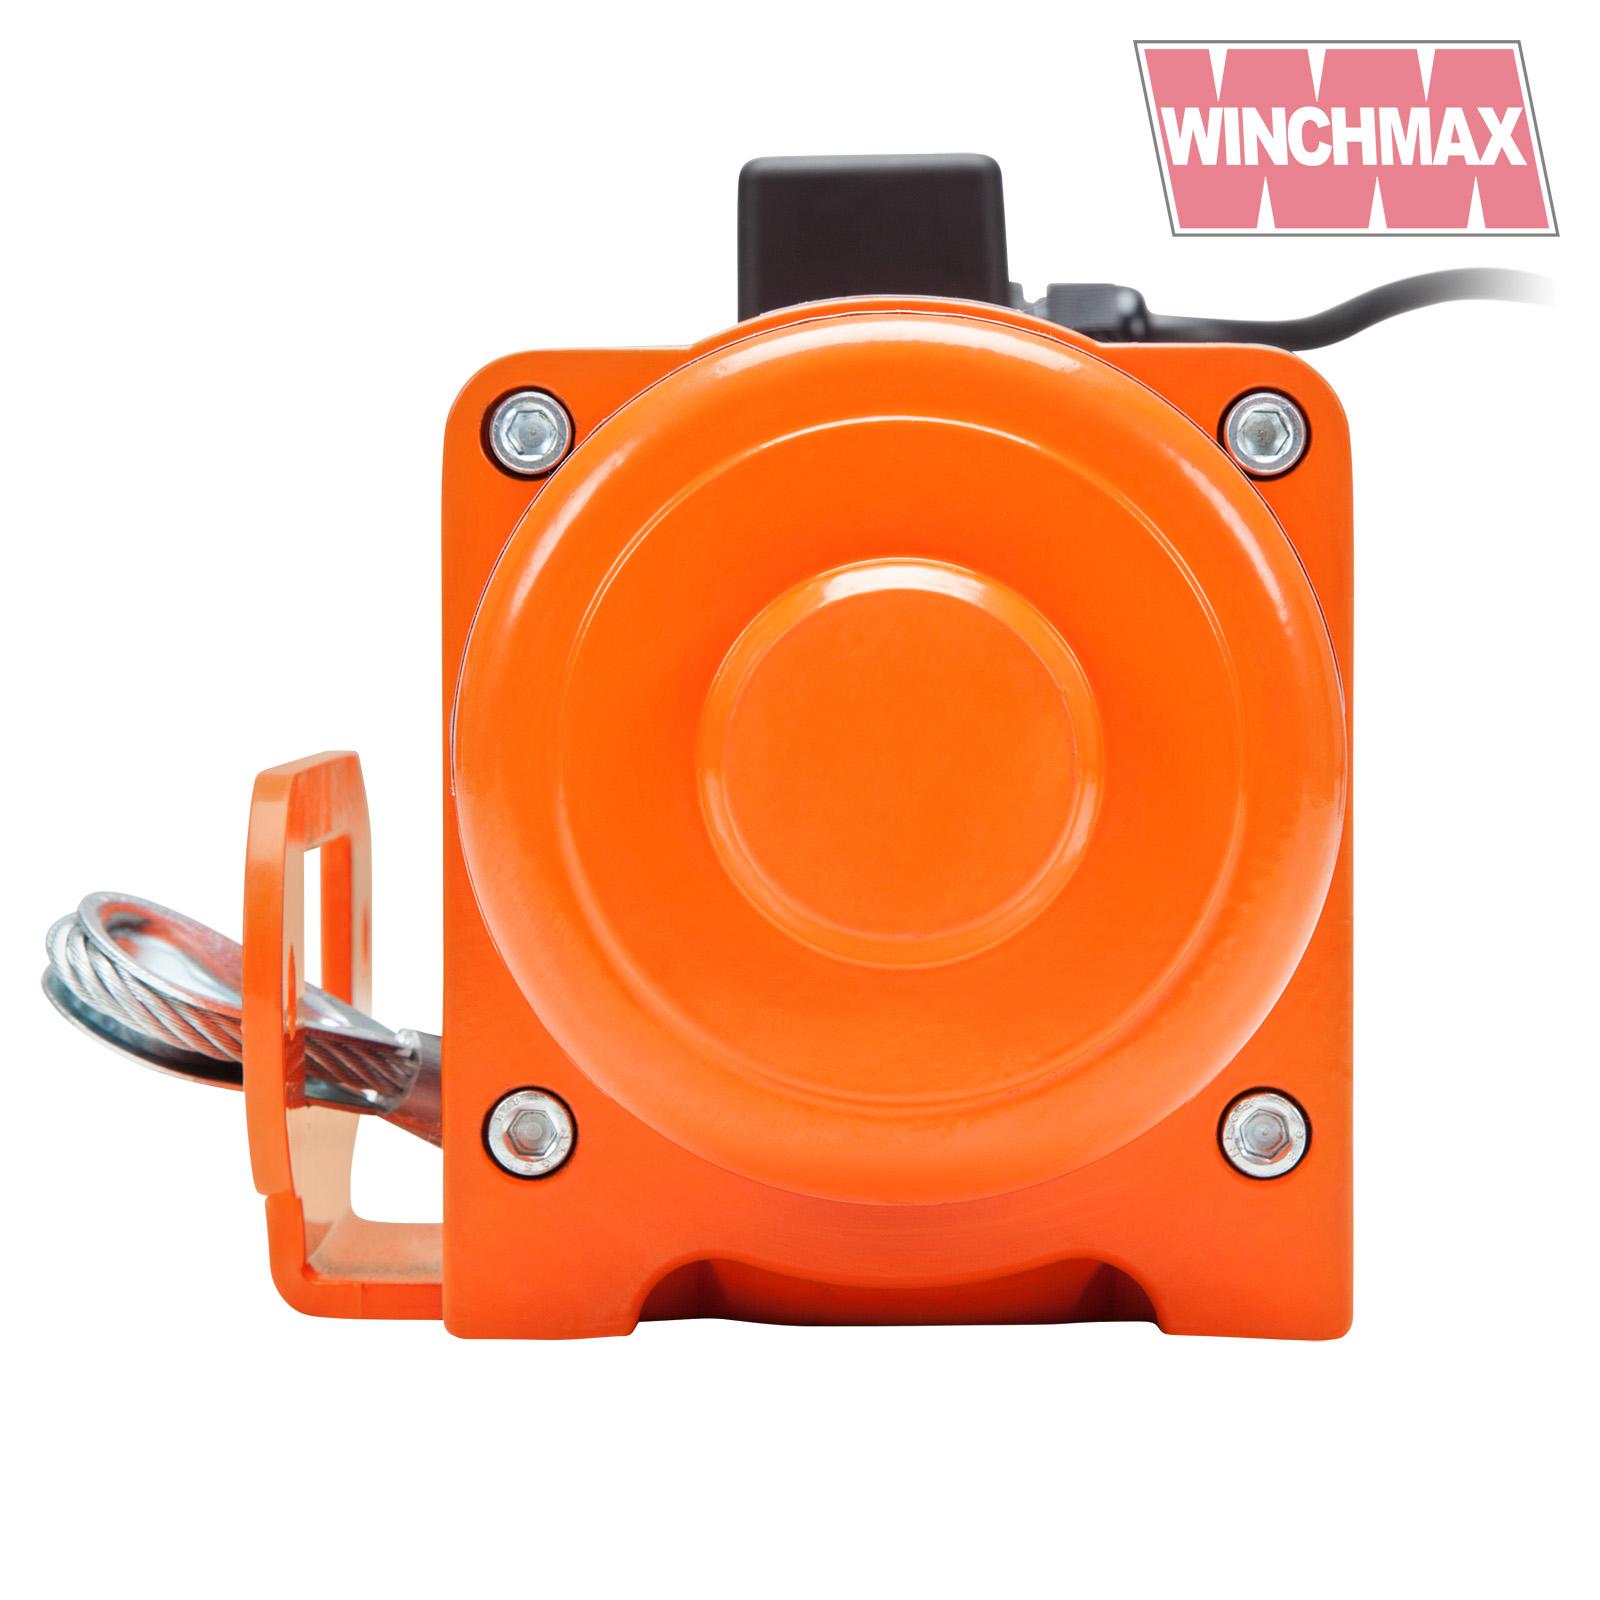 Wmac3000 winchmax 232